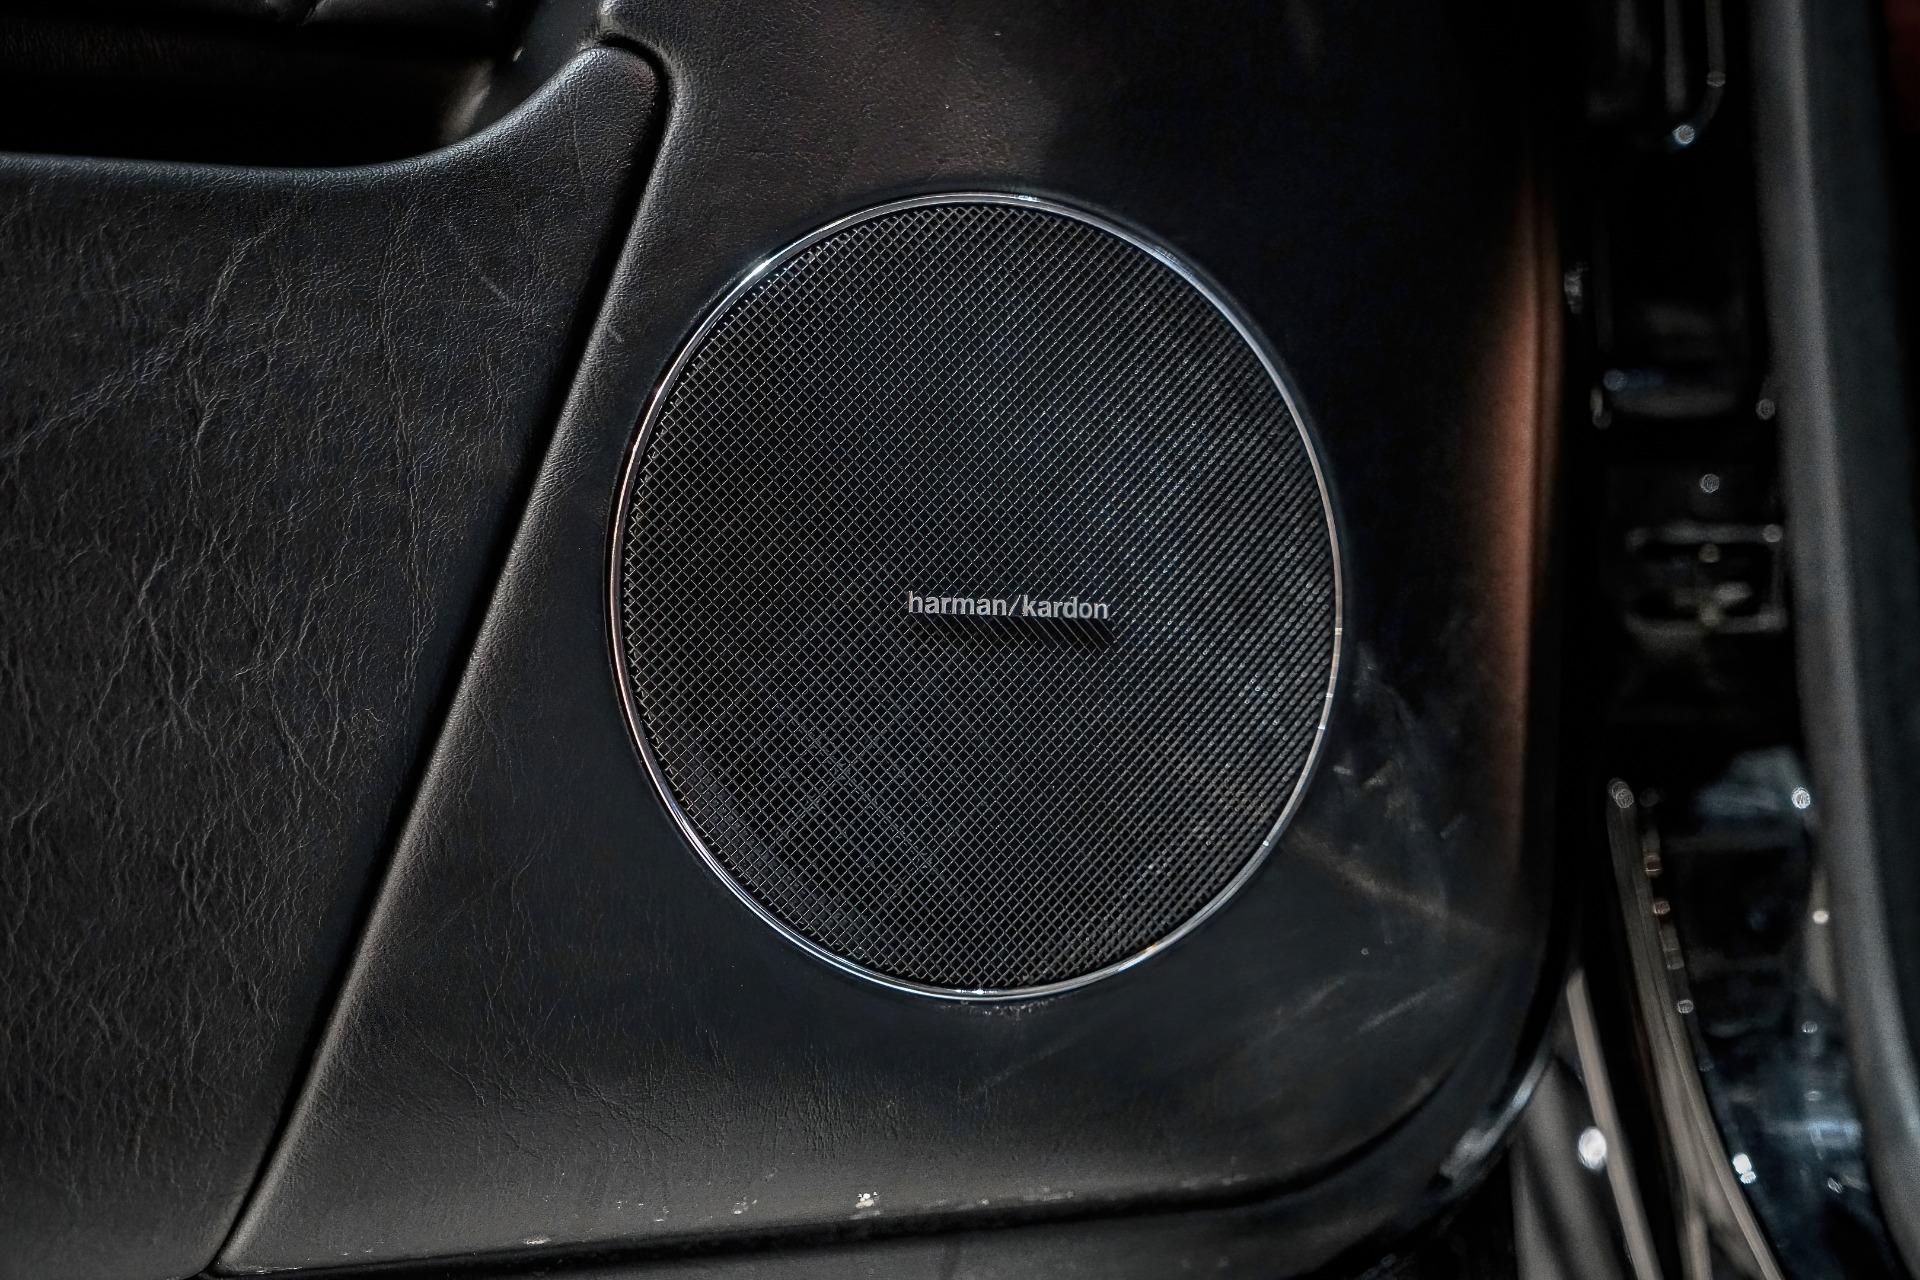 Used-2013-Mercedes-Benz-G63-AMG-SUV-DESIGNO-DIAMOND-CUT-INTERIOR-ONE-OWNER